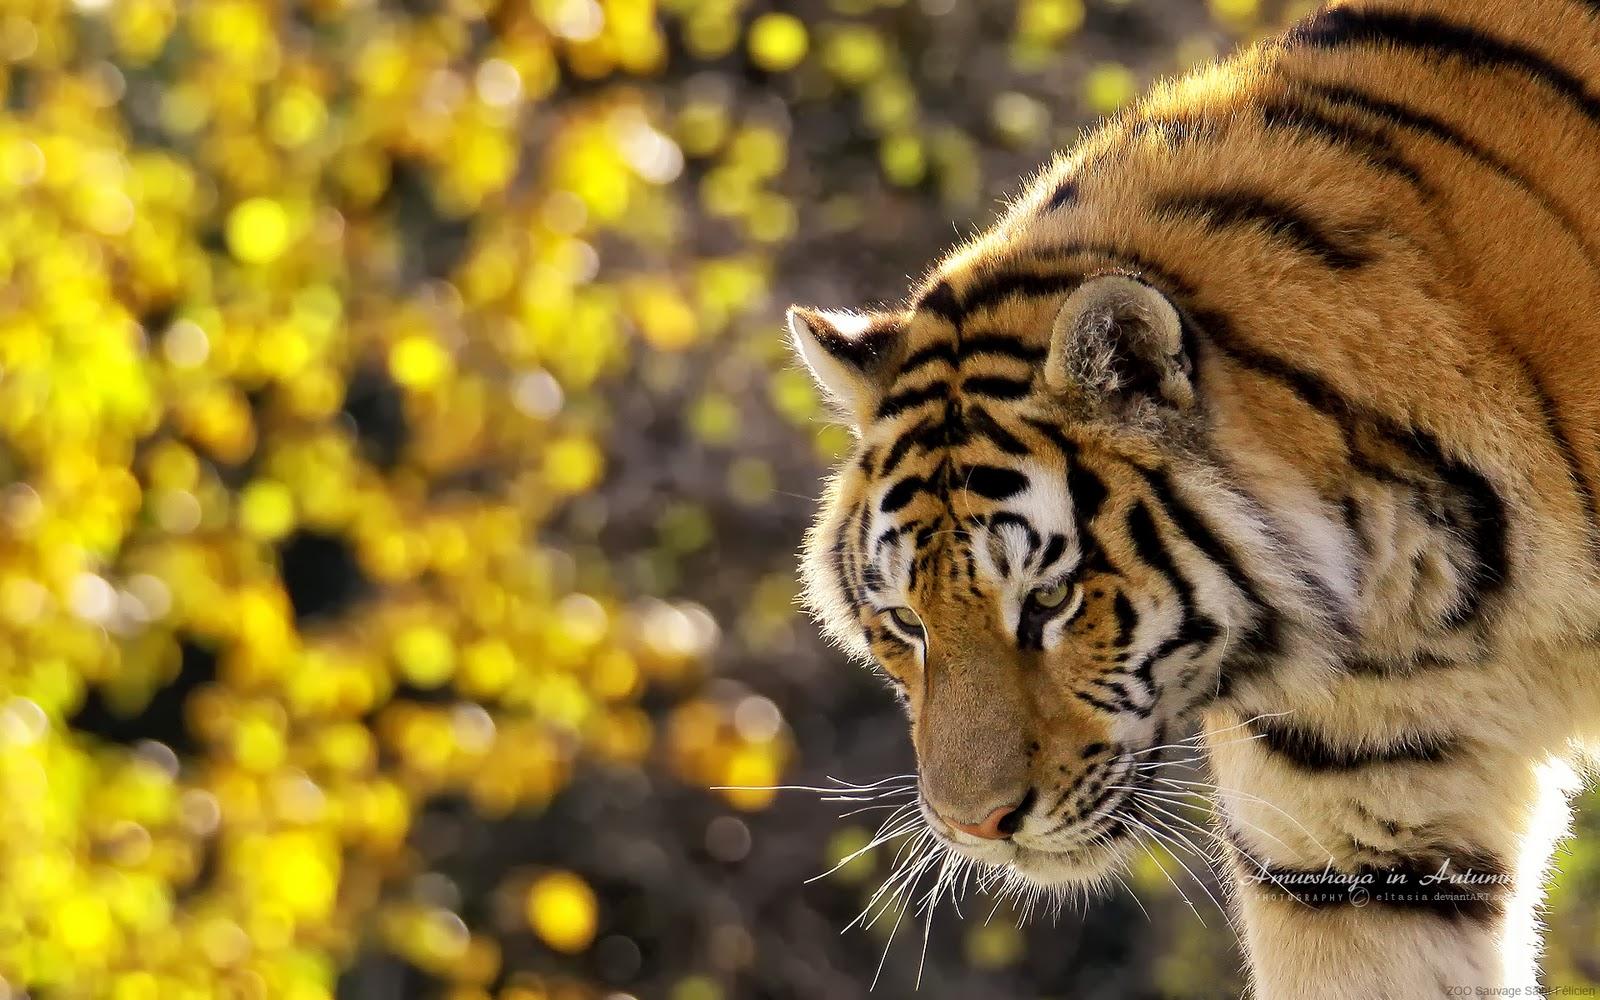 Cute Baby Love Hd Wallpapers Husn Ke Nazare Tigers Wallpapers